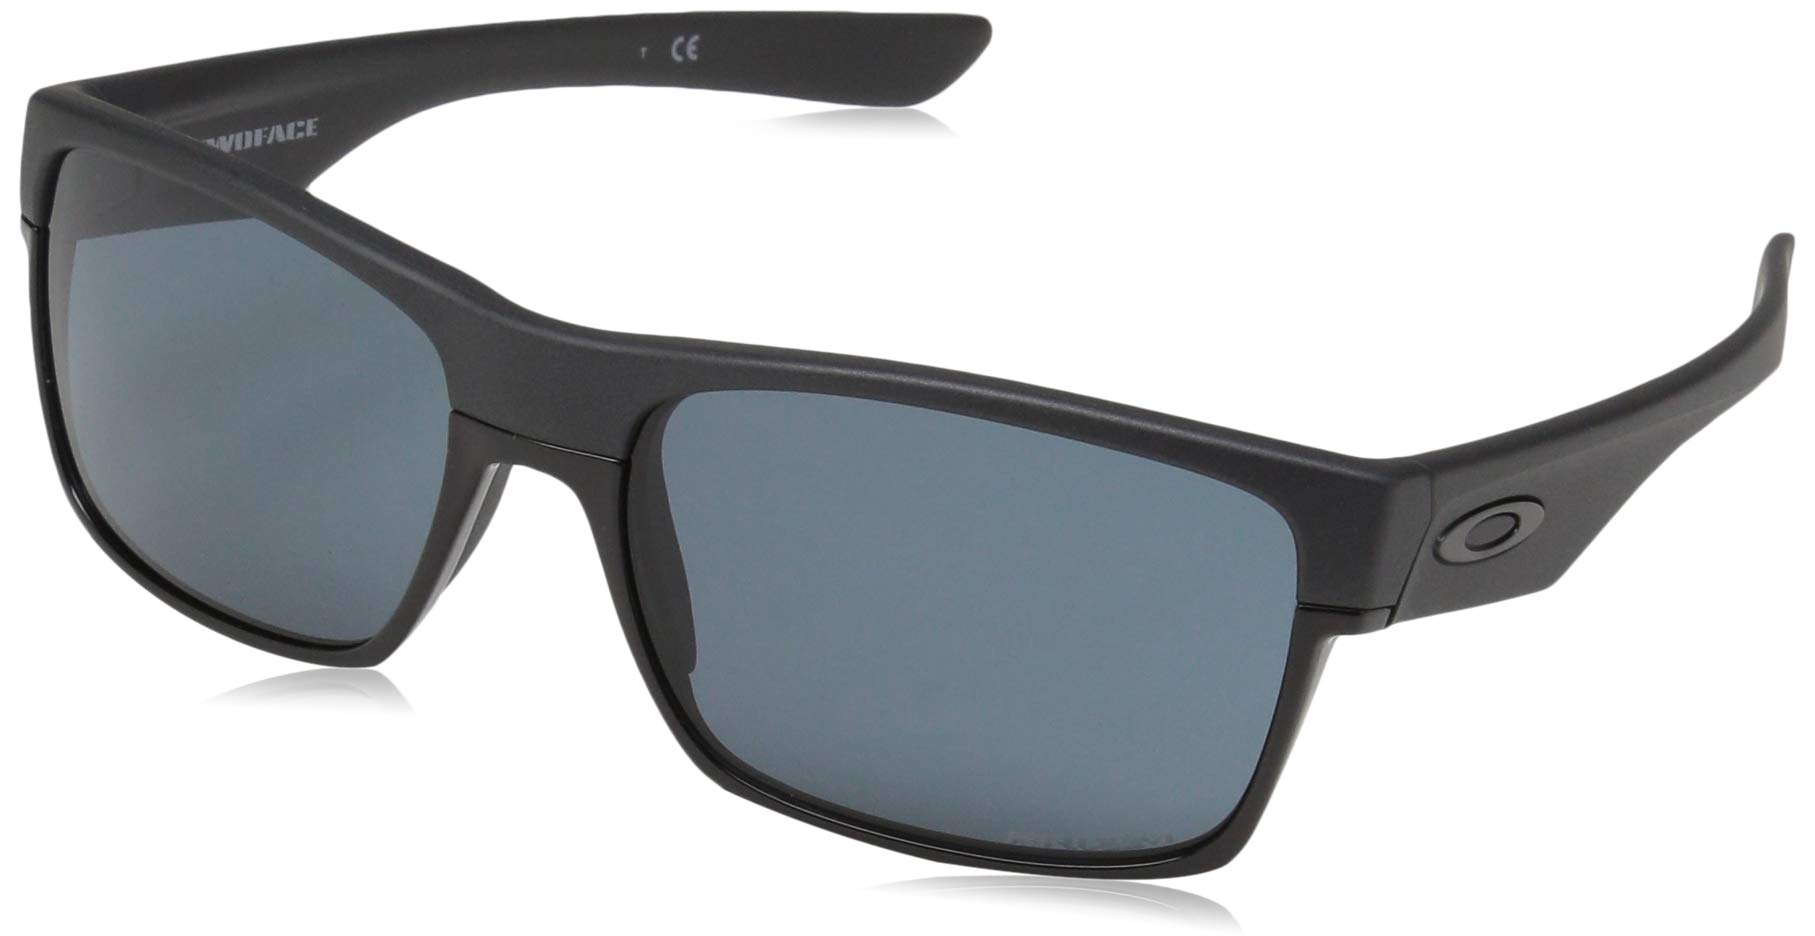 Oakley Men's OO9189 TwoFace Square Sunglasses, Steel/Prizm Grey, 60 mm